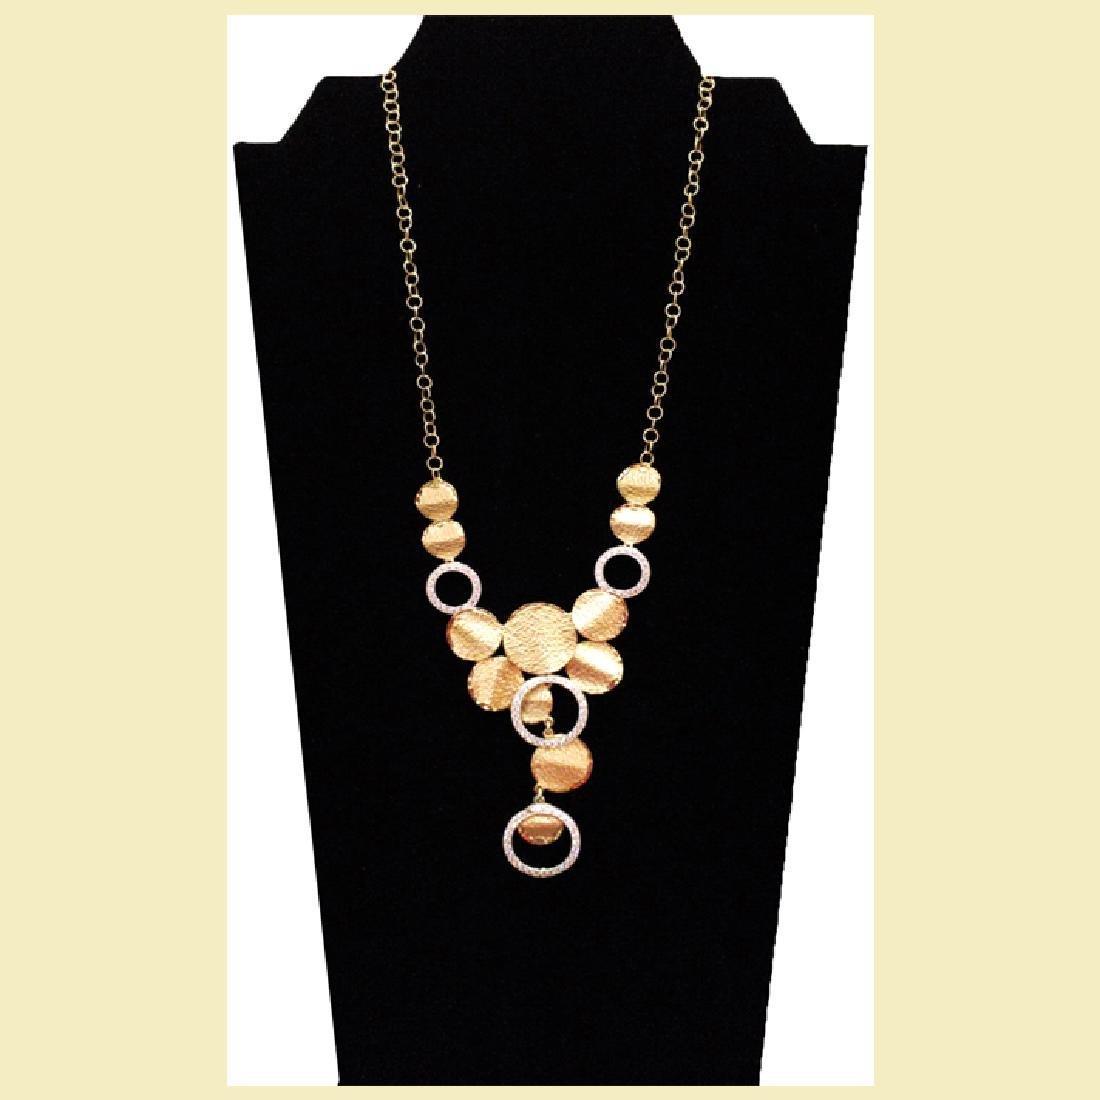 Gorgeous unique pattern necklace 14k yellow &white gold